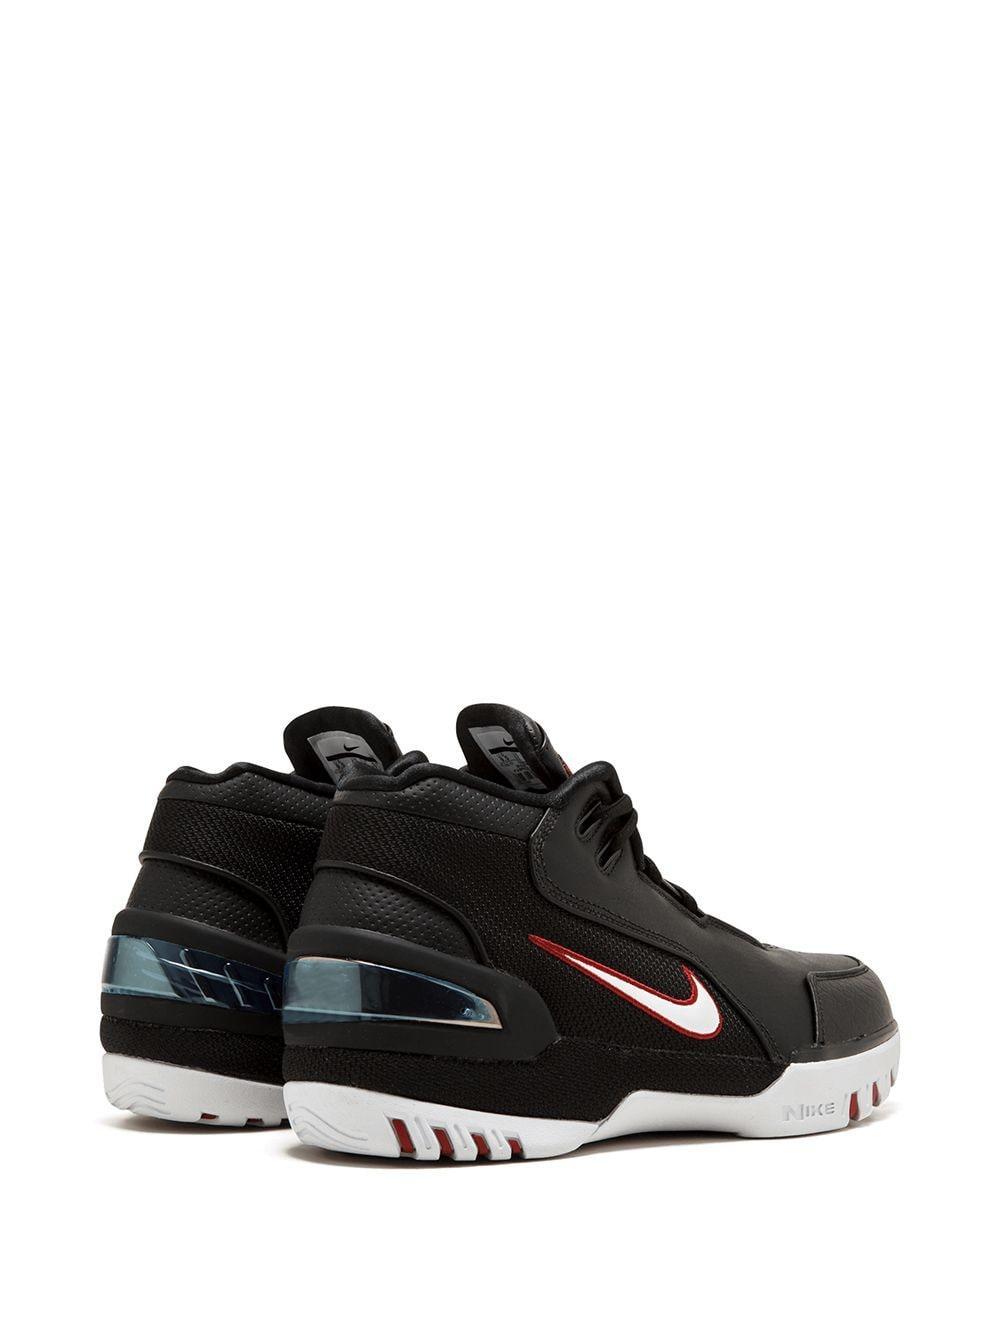 Nike Leer Air Zoom Generation As Sneakers in het Zwart voor heren